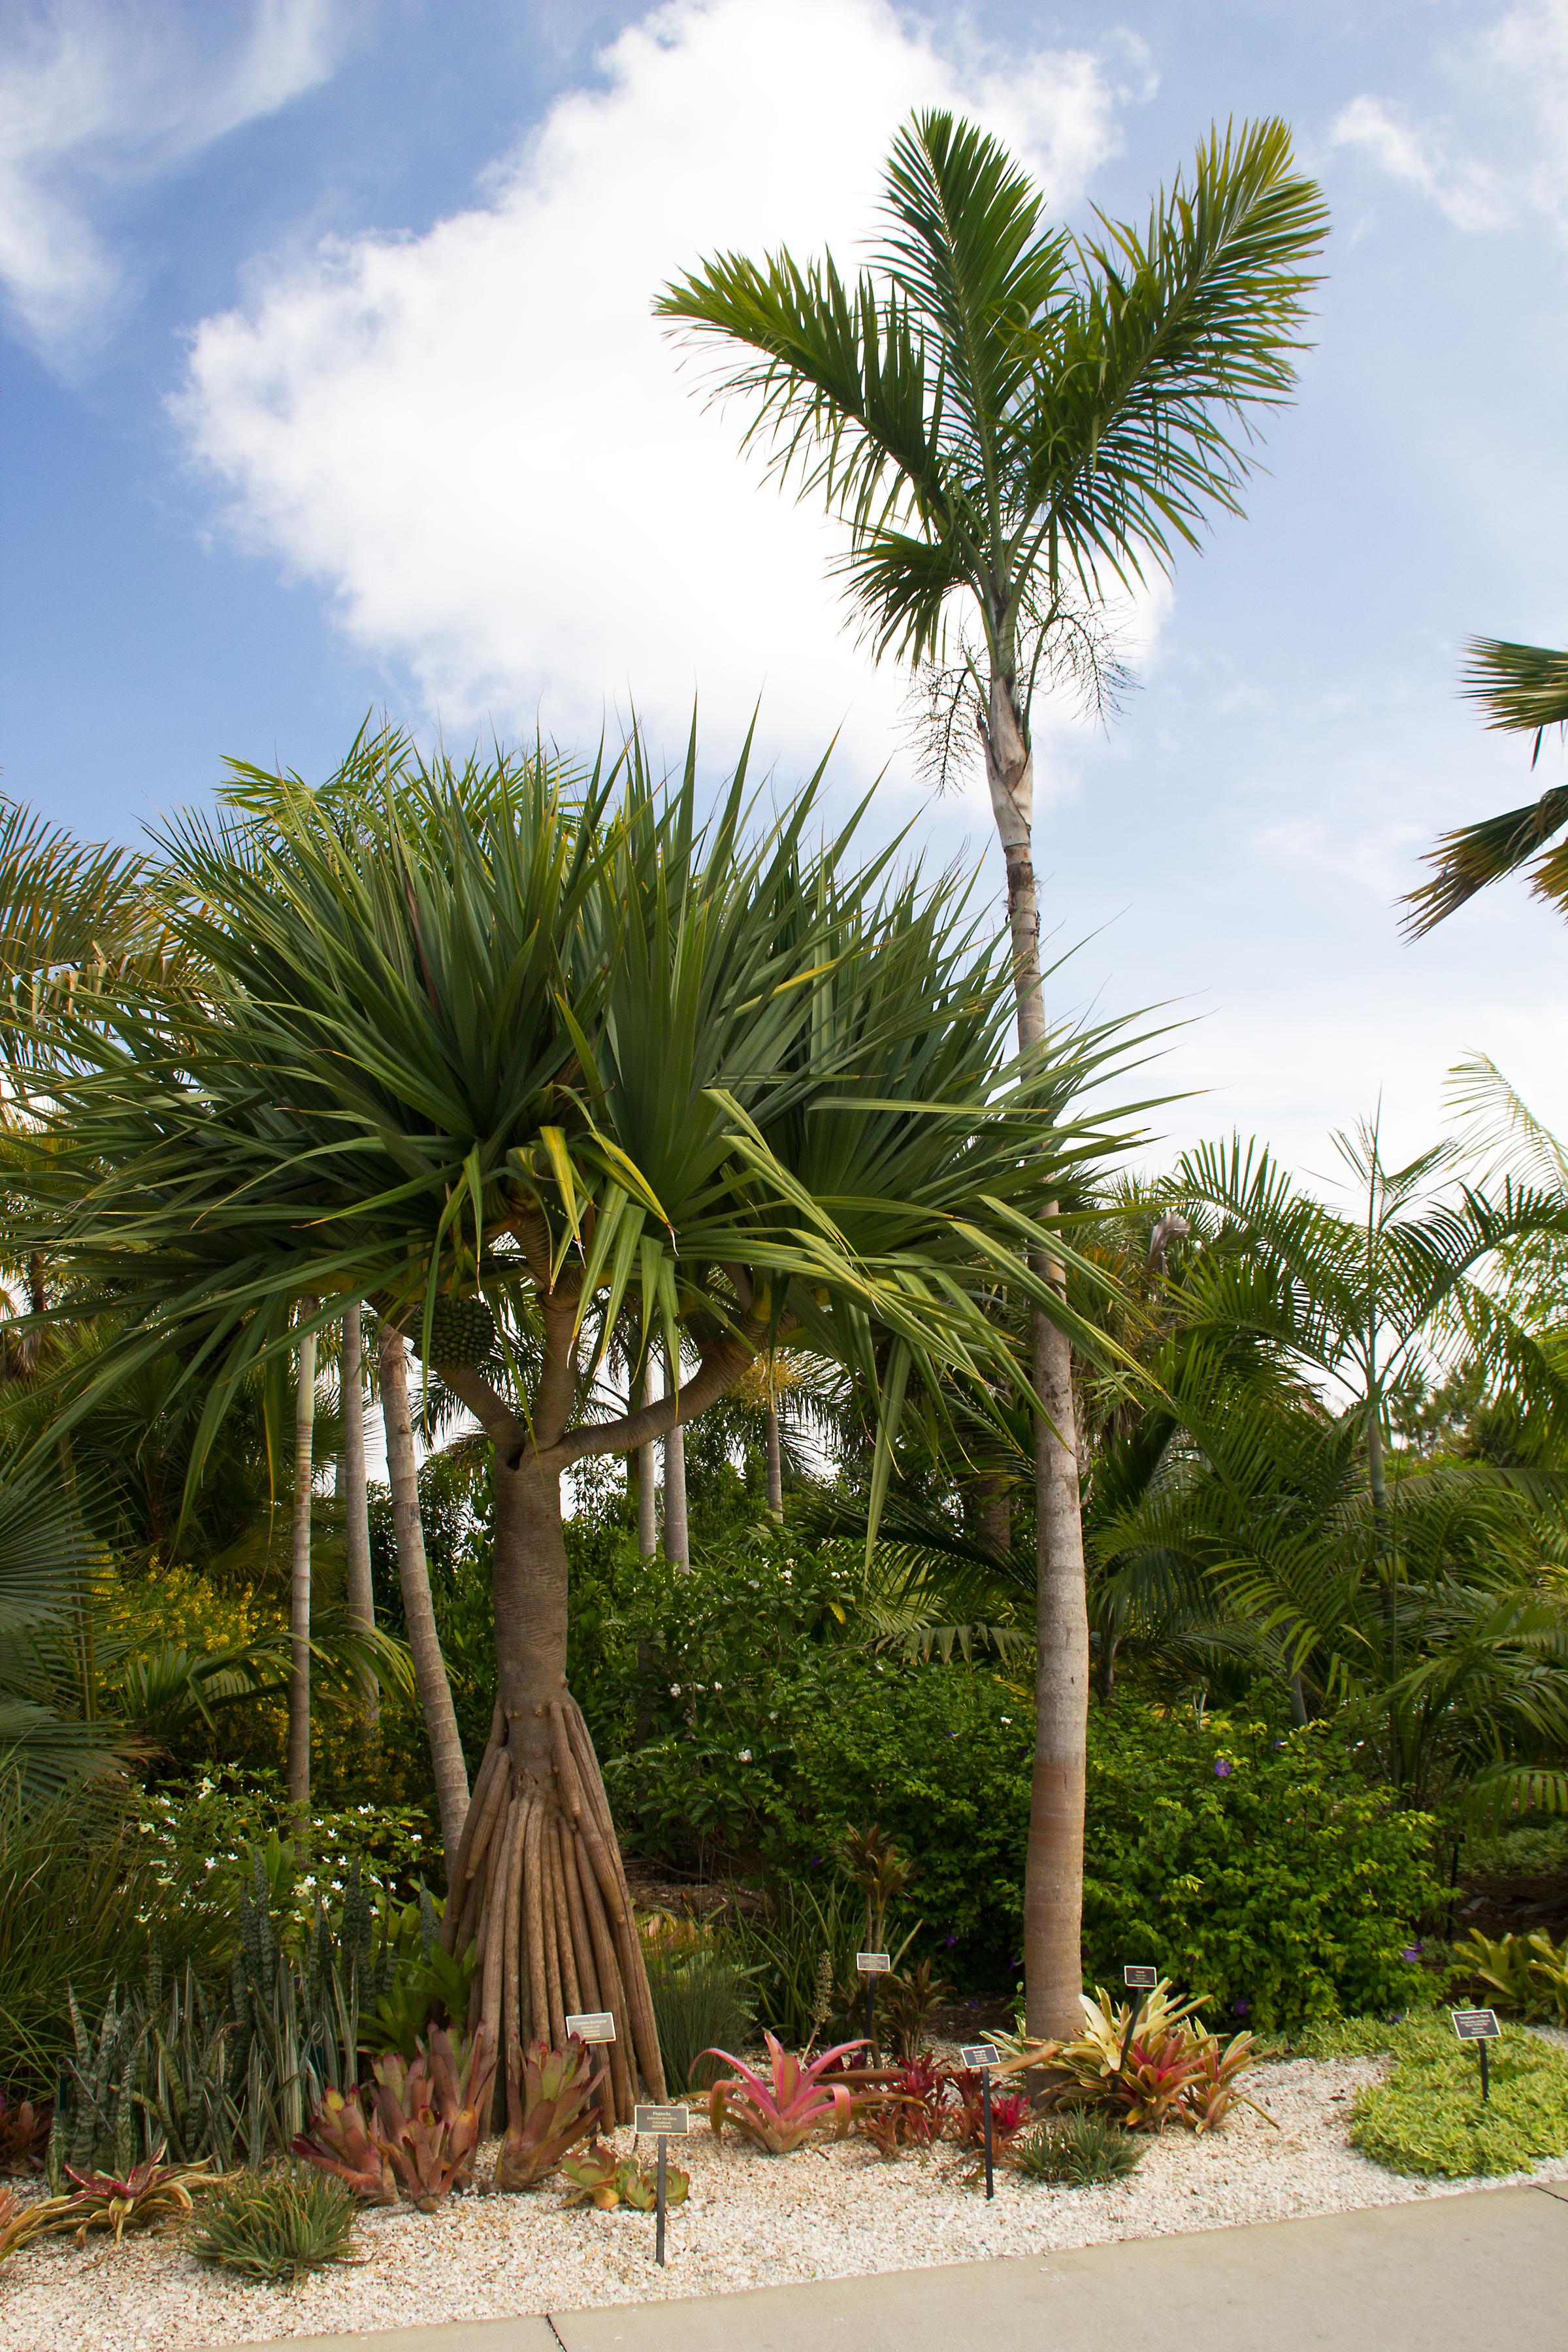 Asian Garden: Screwpine And Palm